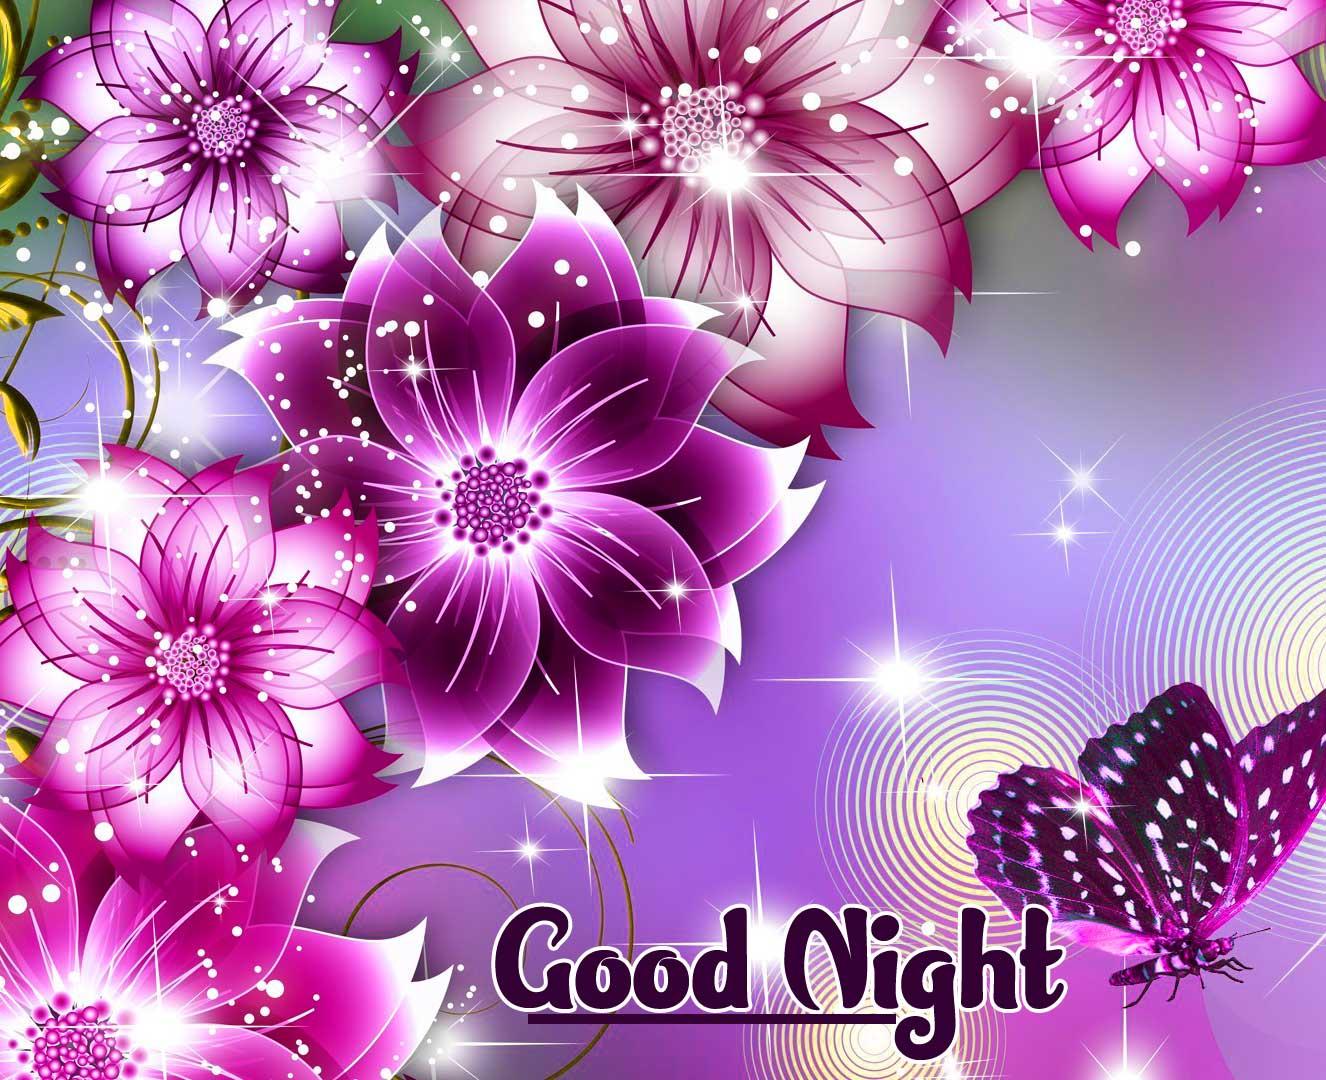 Cute Babies Good Night ImagesPics Free Download